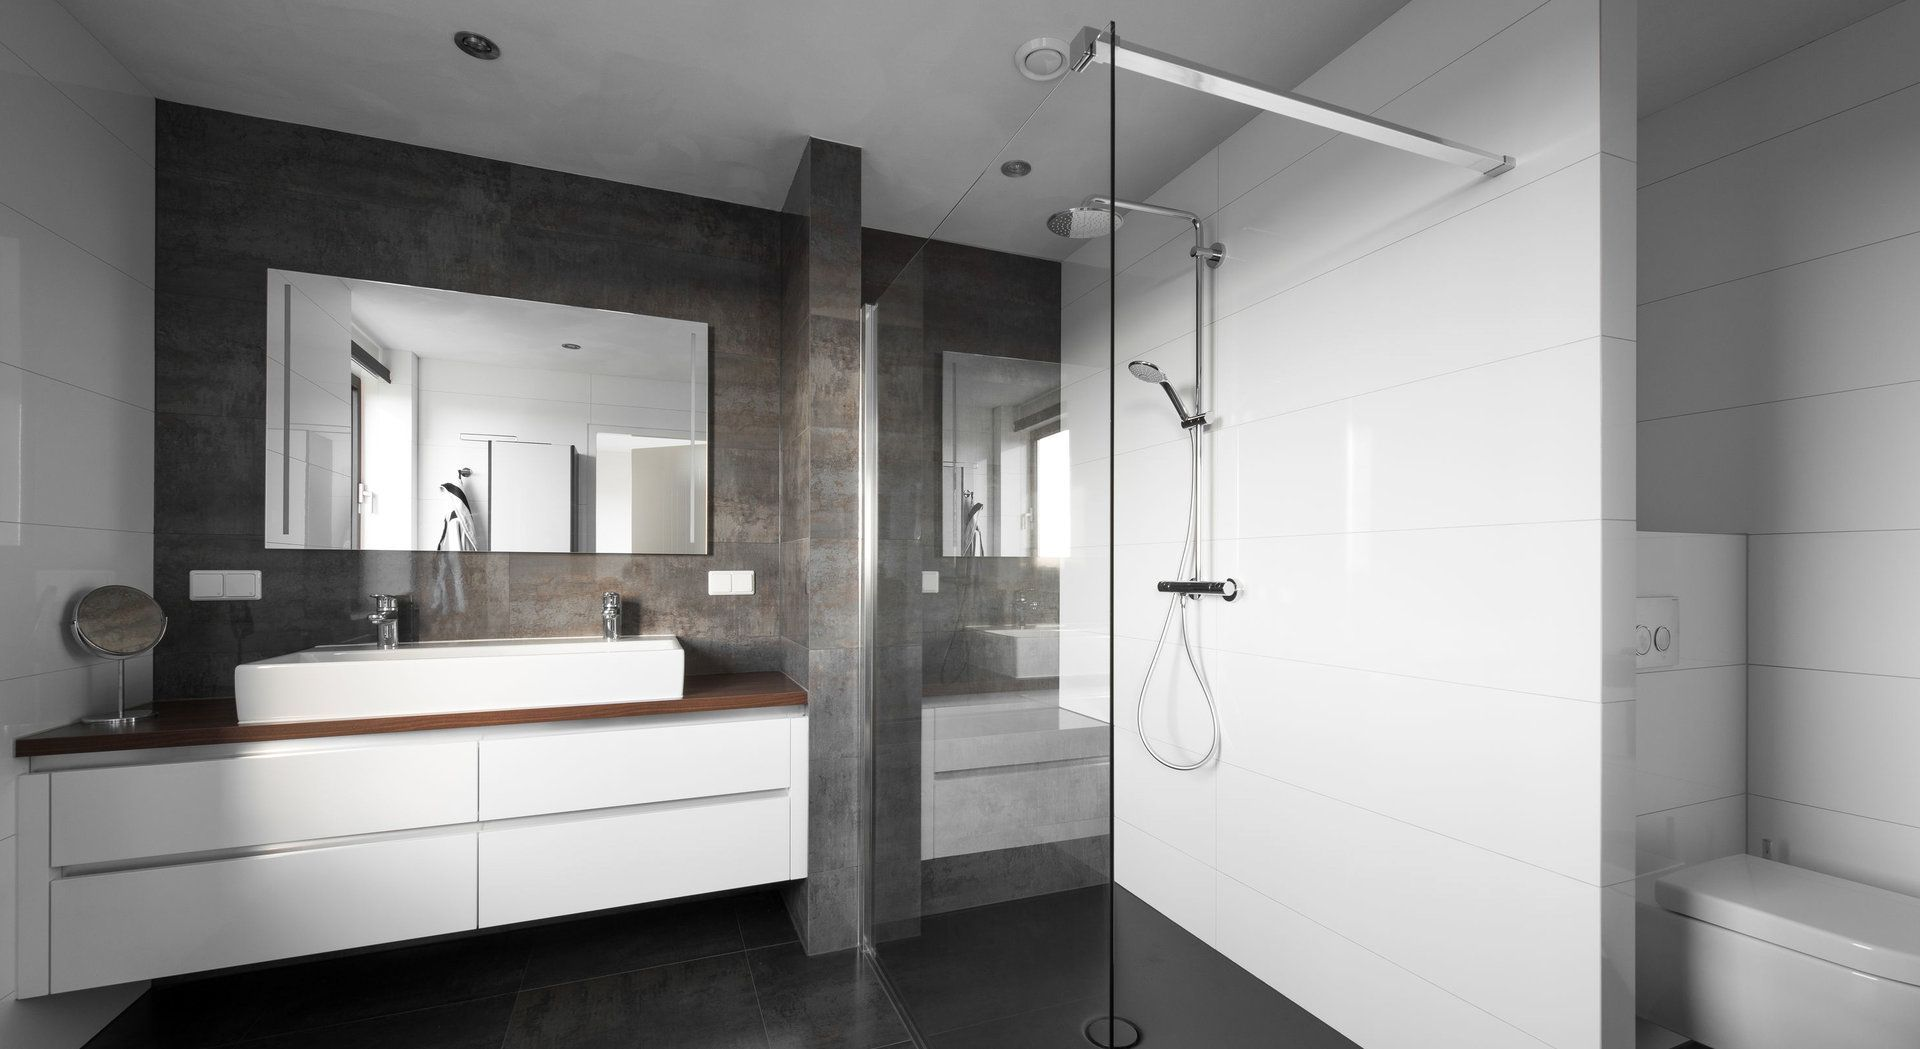 Strakke Middelkoop Culemborg badkamer met Venis tegels. Warm accent ...